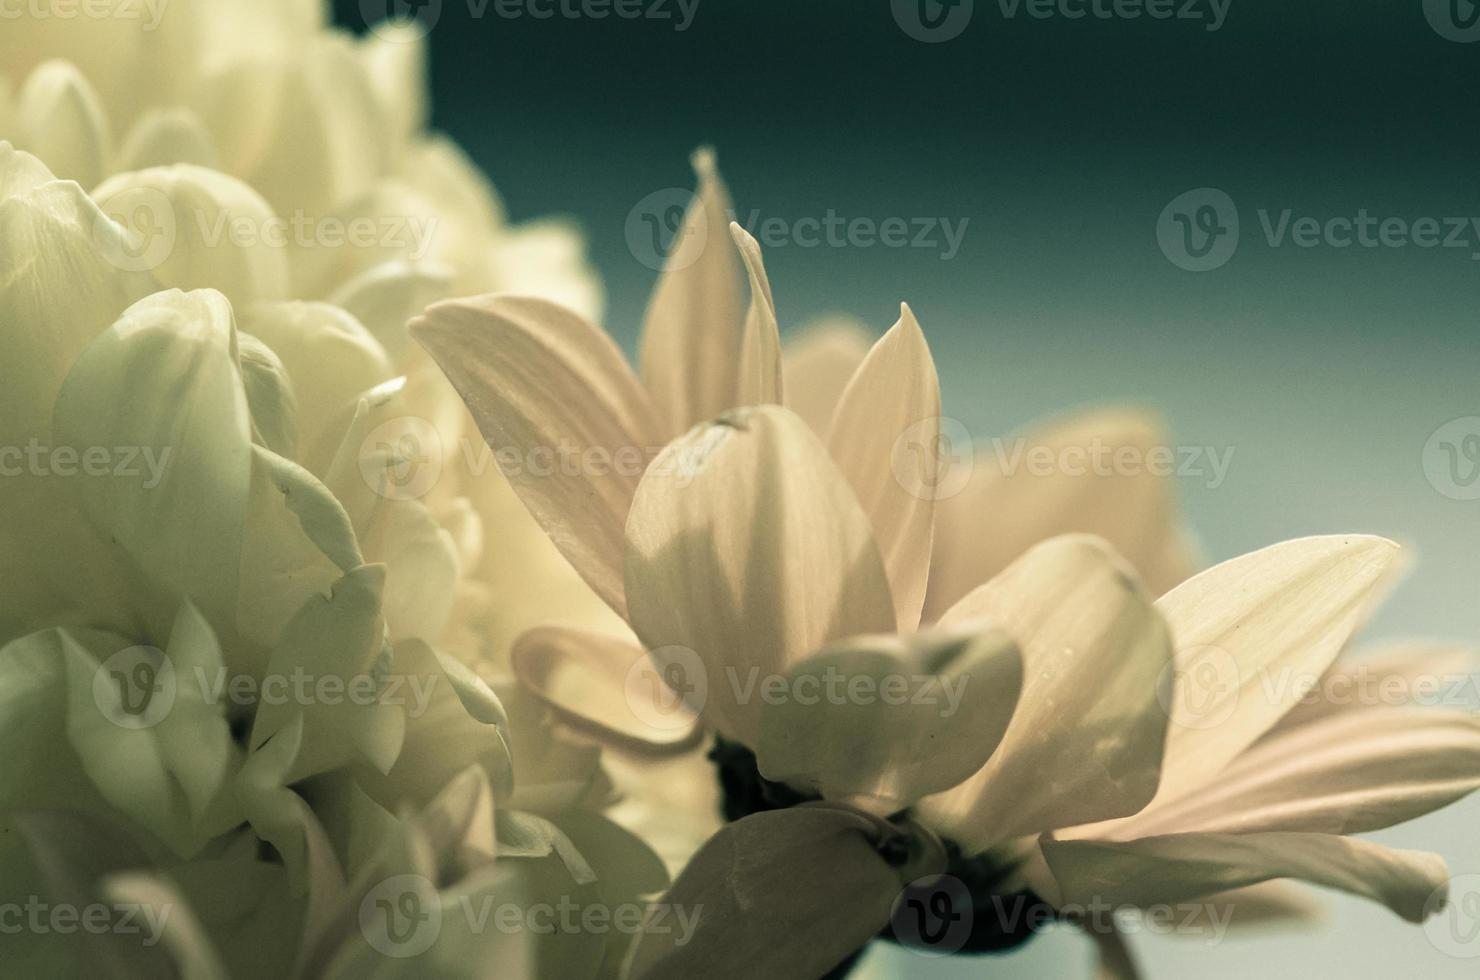 chrysanthemum bloem foto